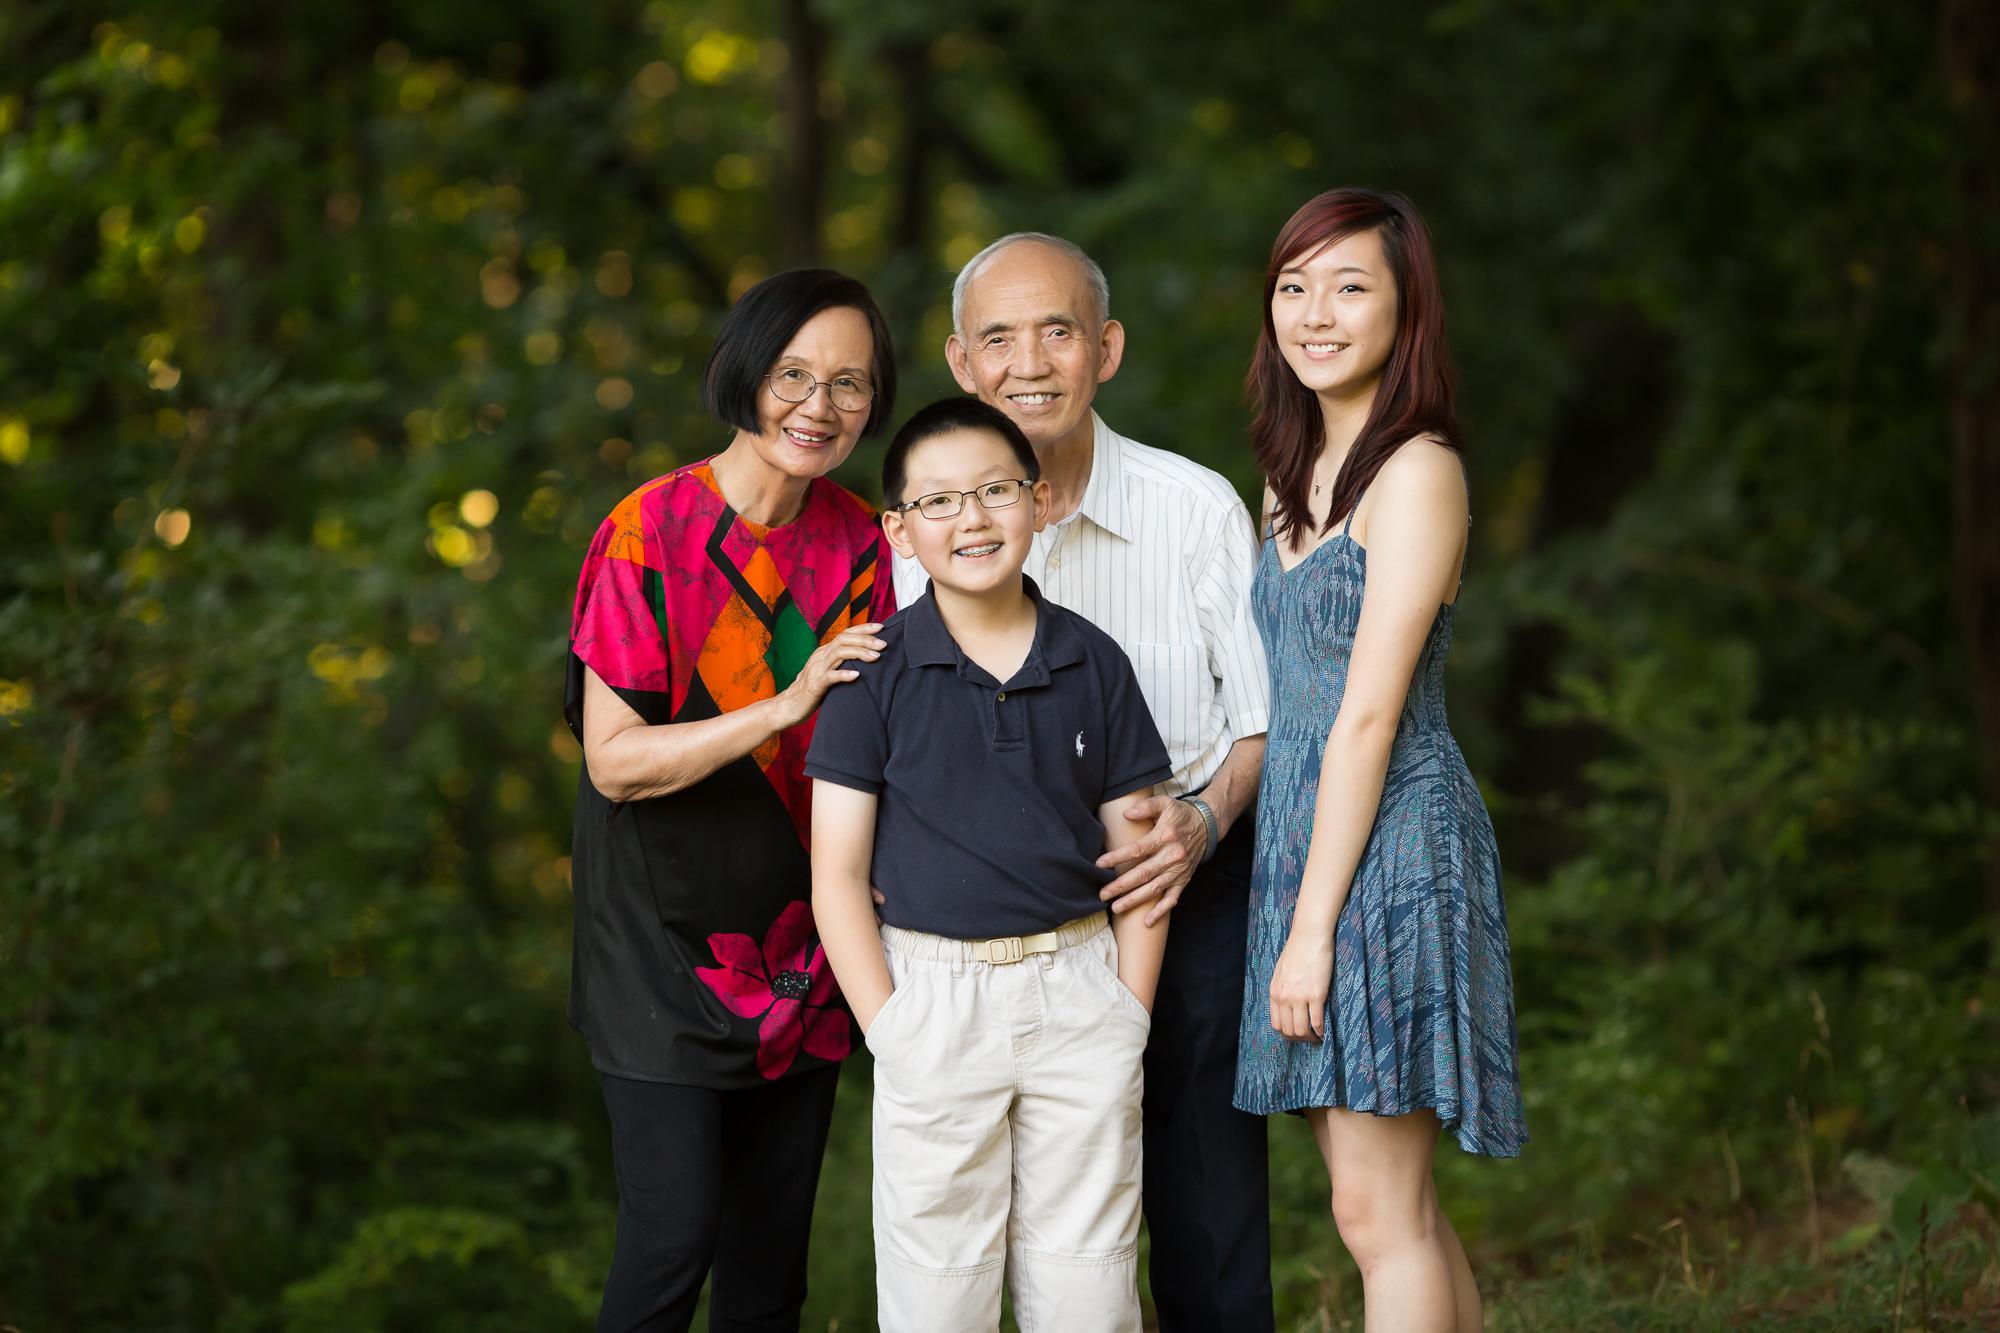 Ann Arbor extended family photographer